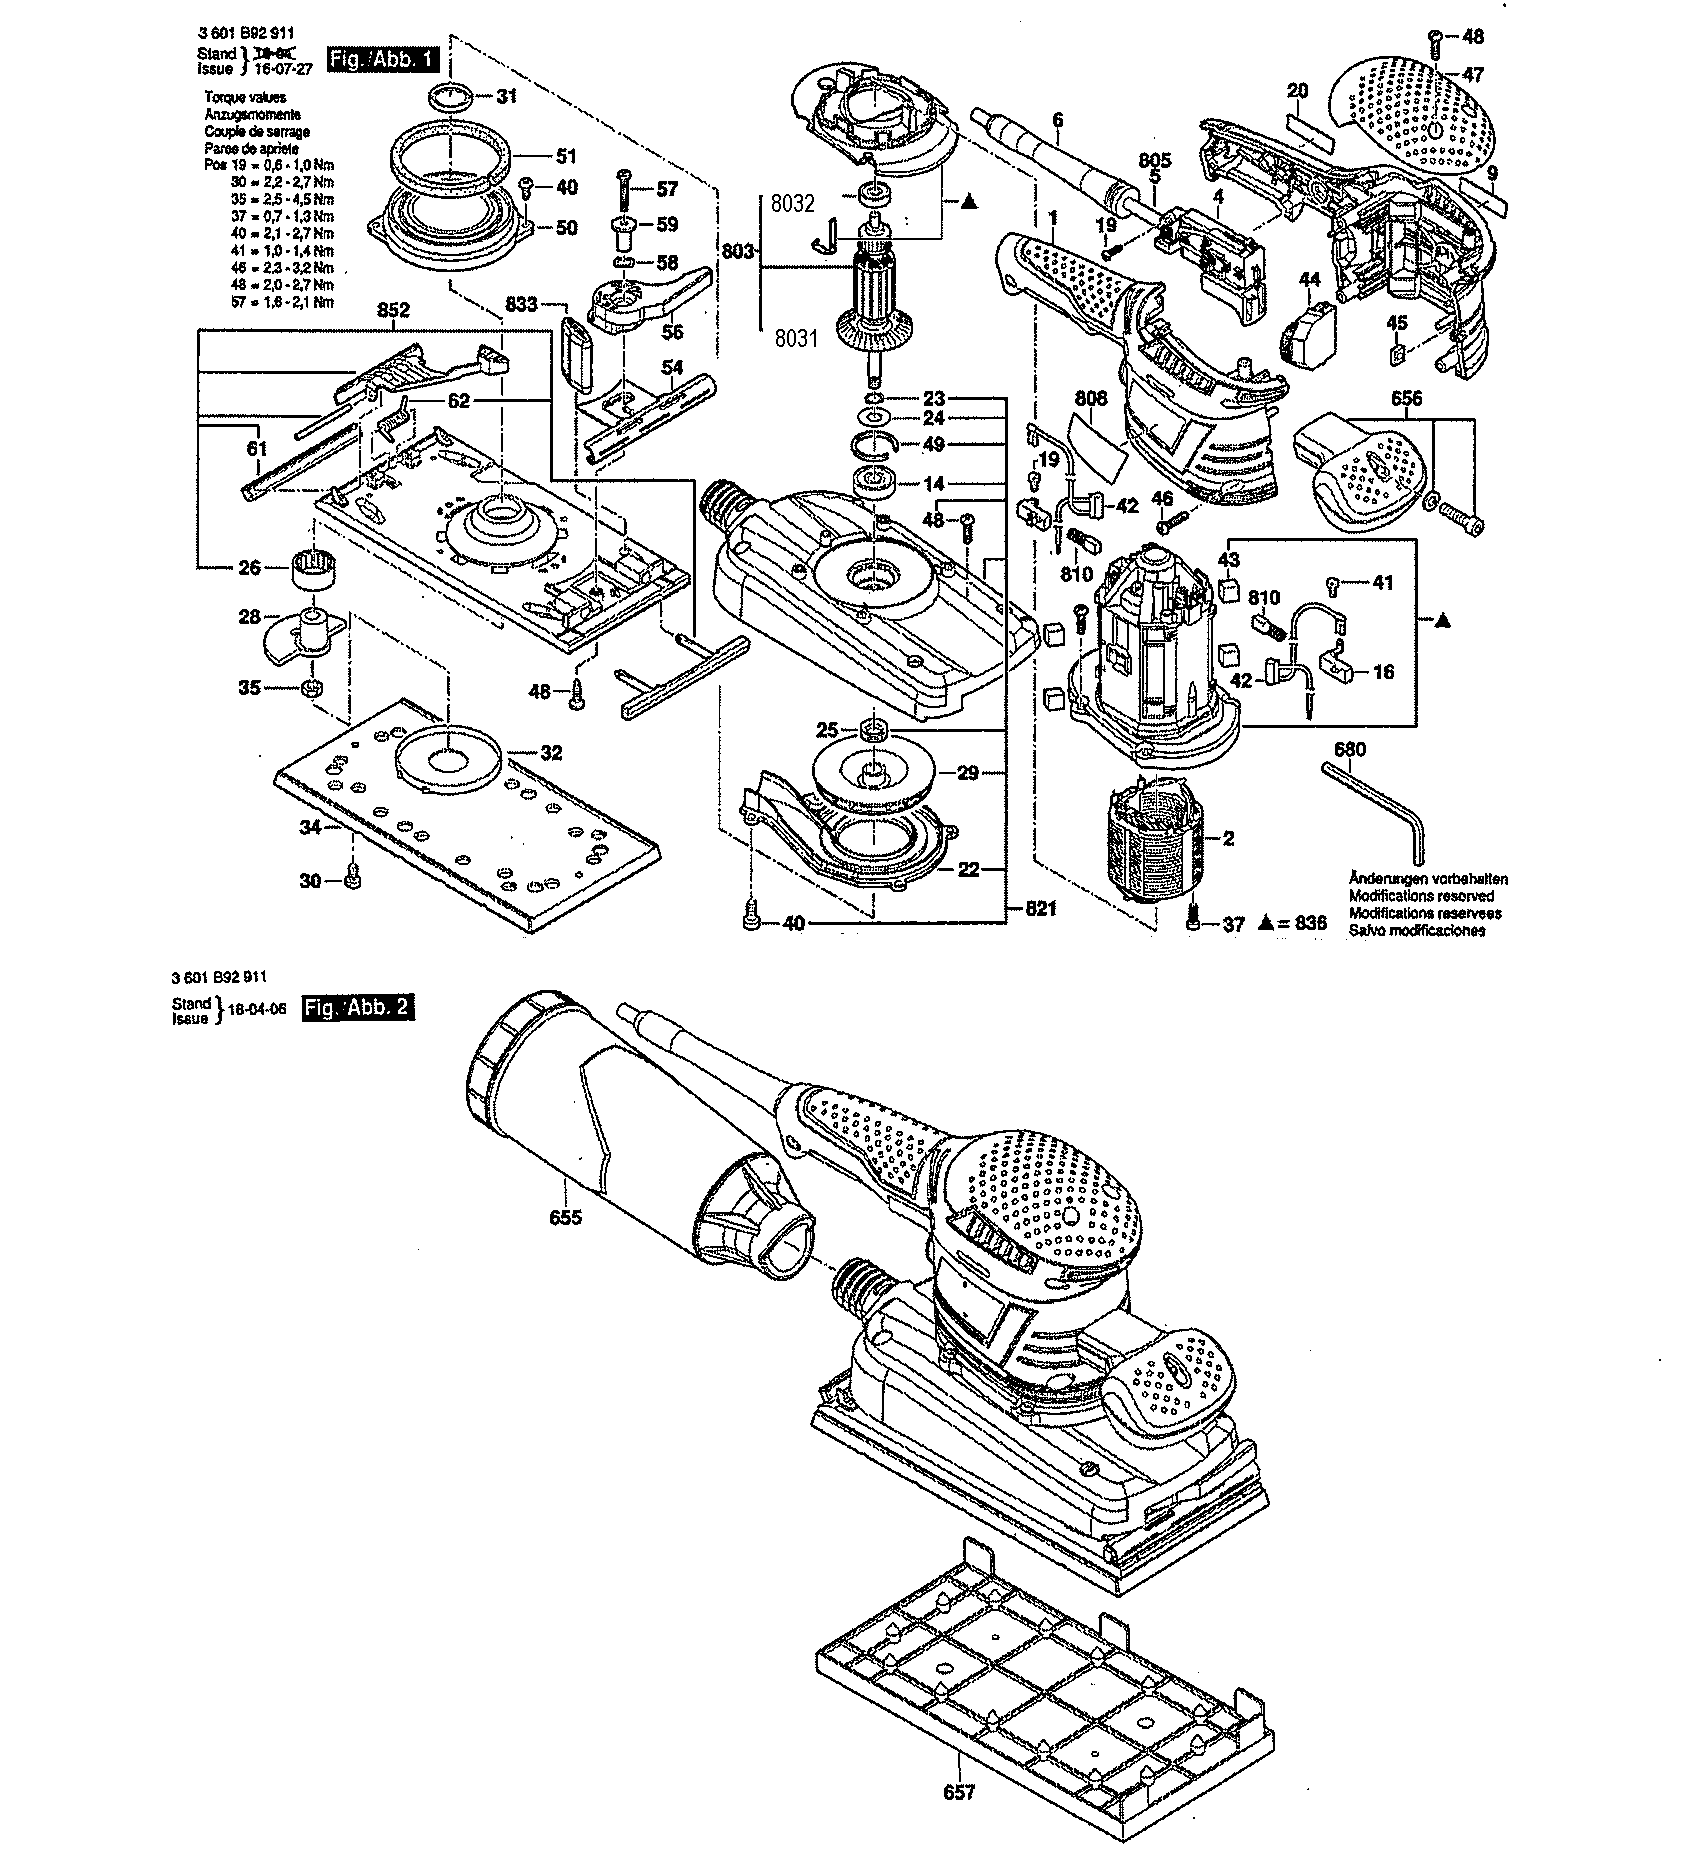 Bosch model OS50VC sander genuine parts